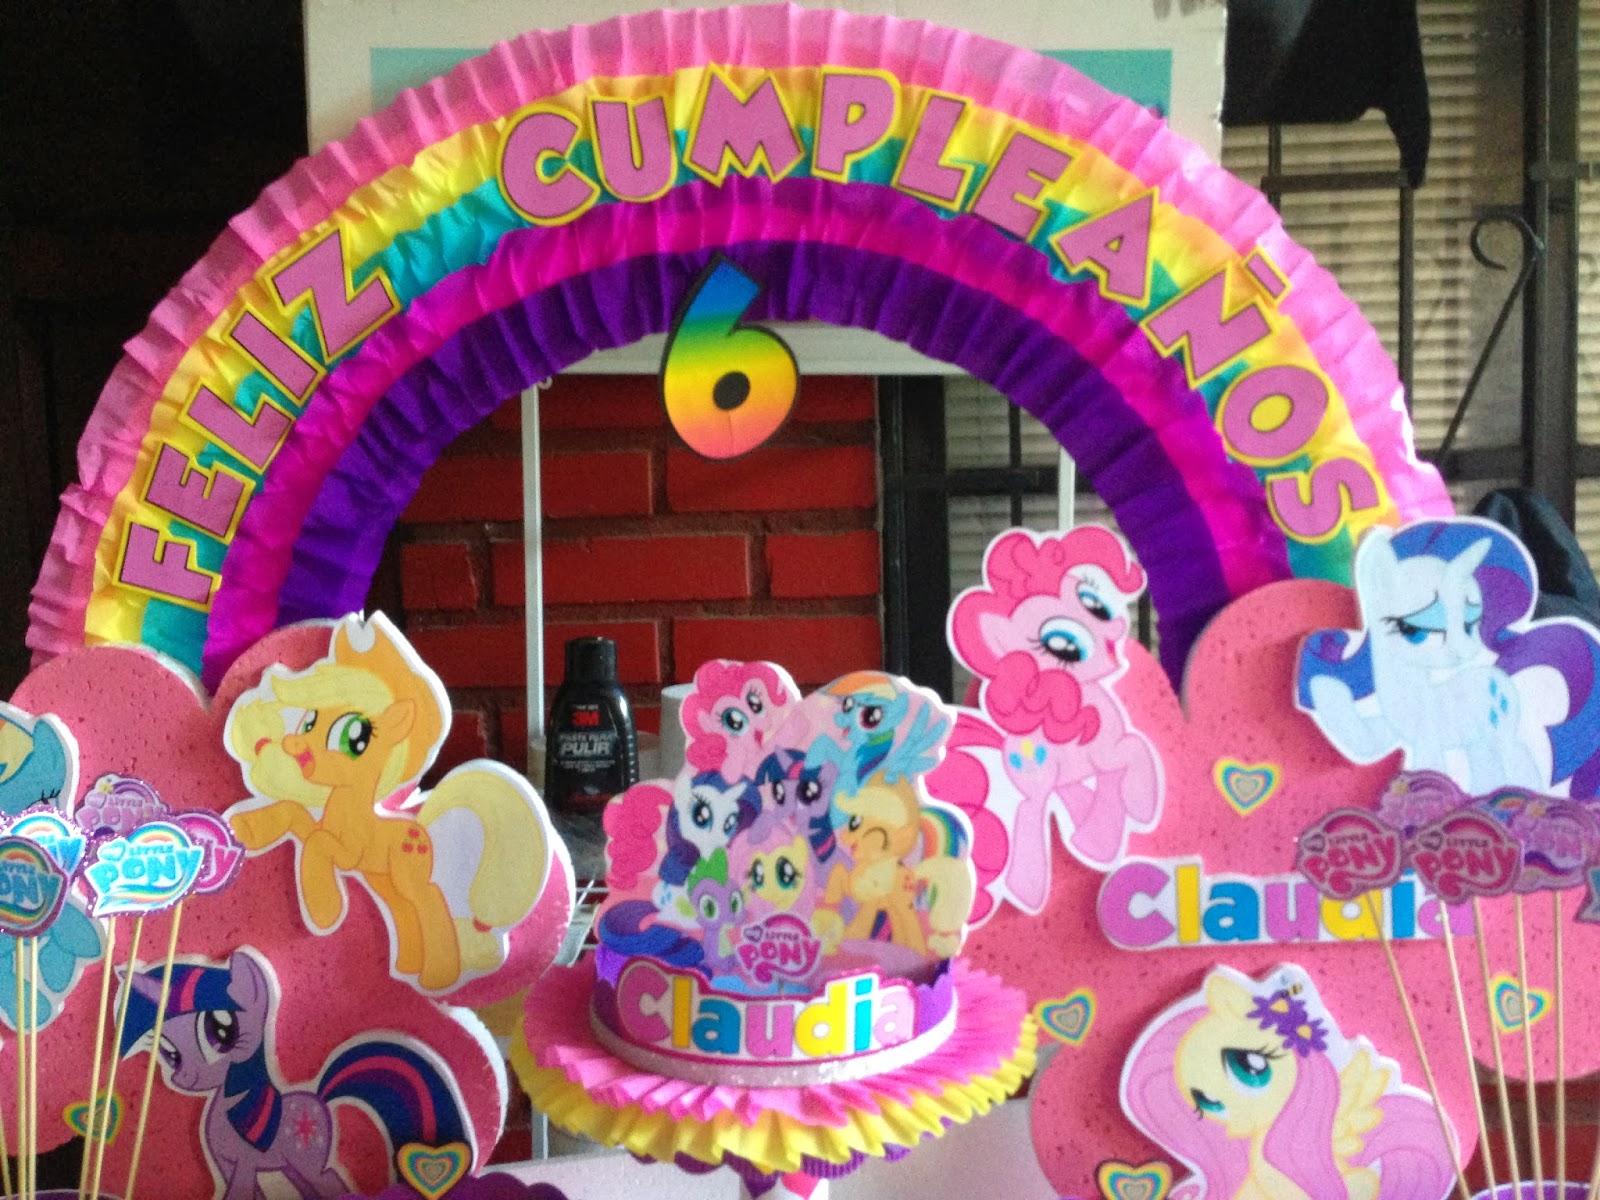 Decoraciones infantiles my little pony for Decoraciones infantiles